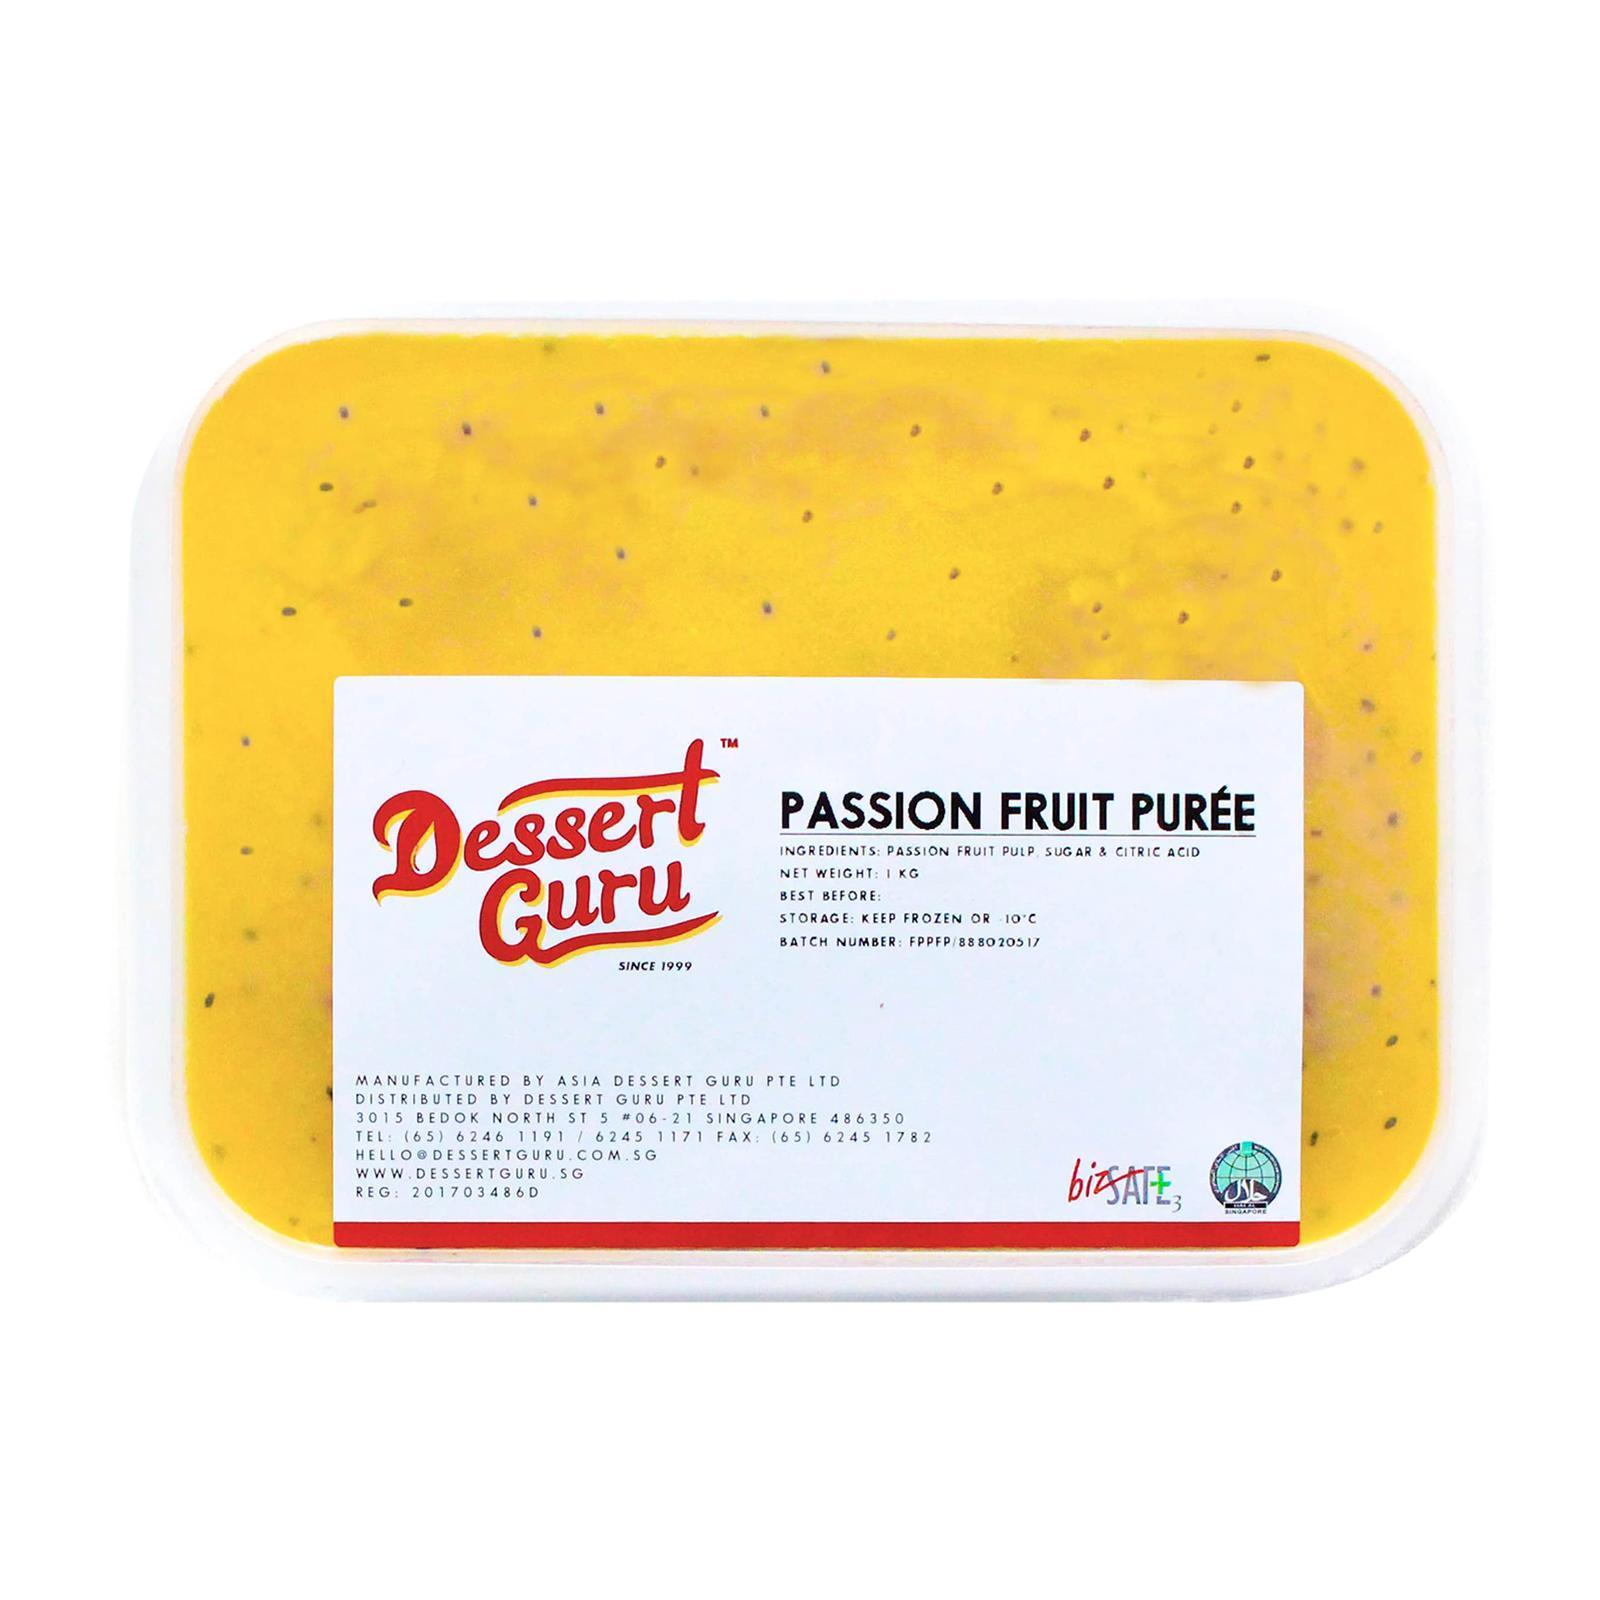 Dessert Guru Passion Fruit Puree - Frozen By Redmart.